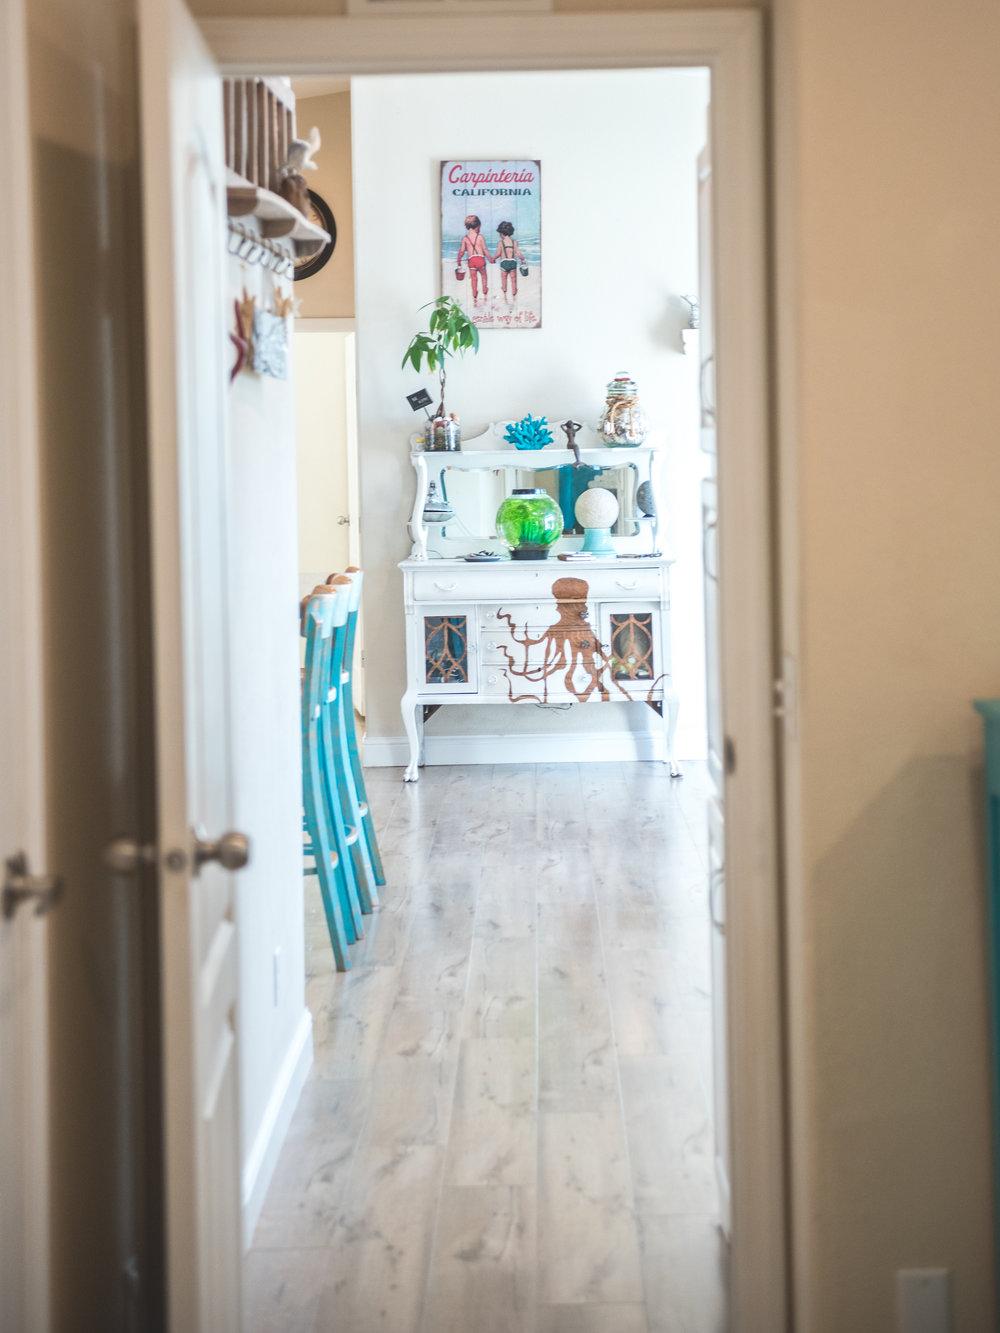 Looking into Kitchen.jpg